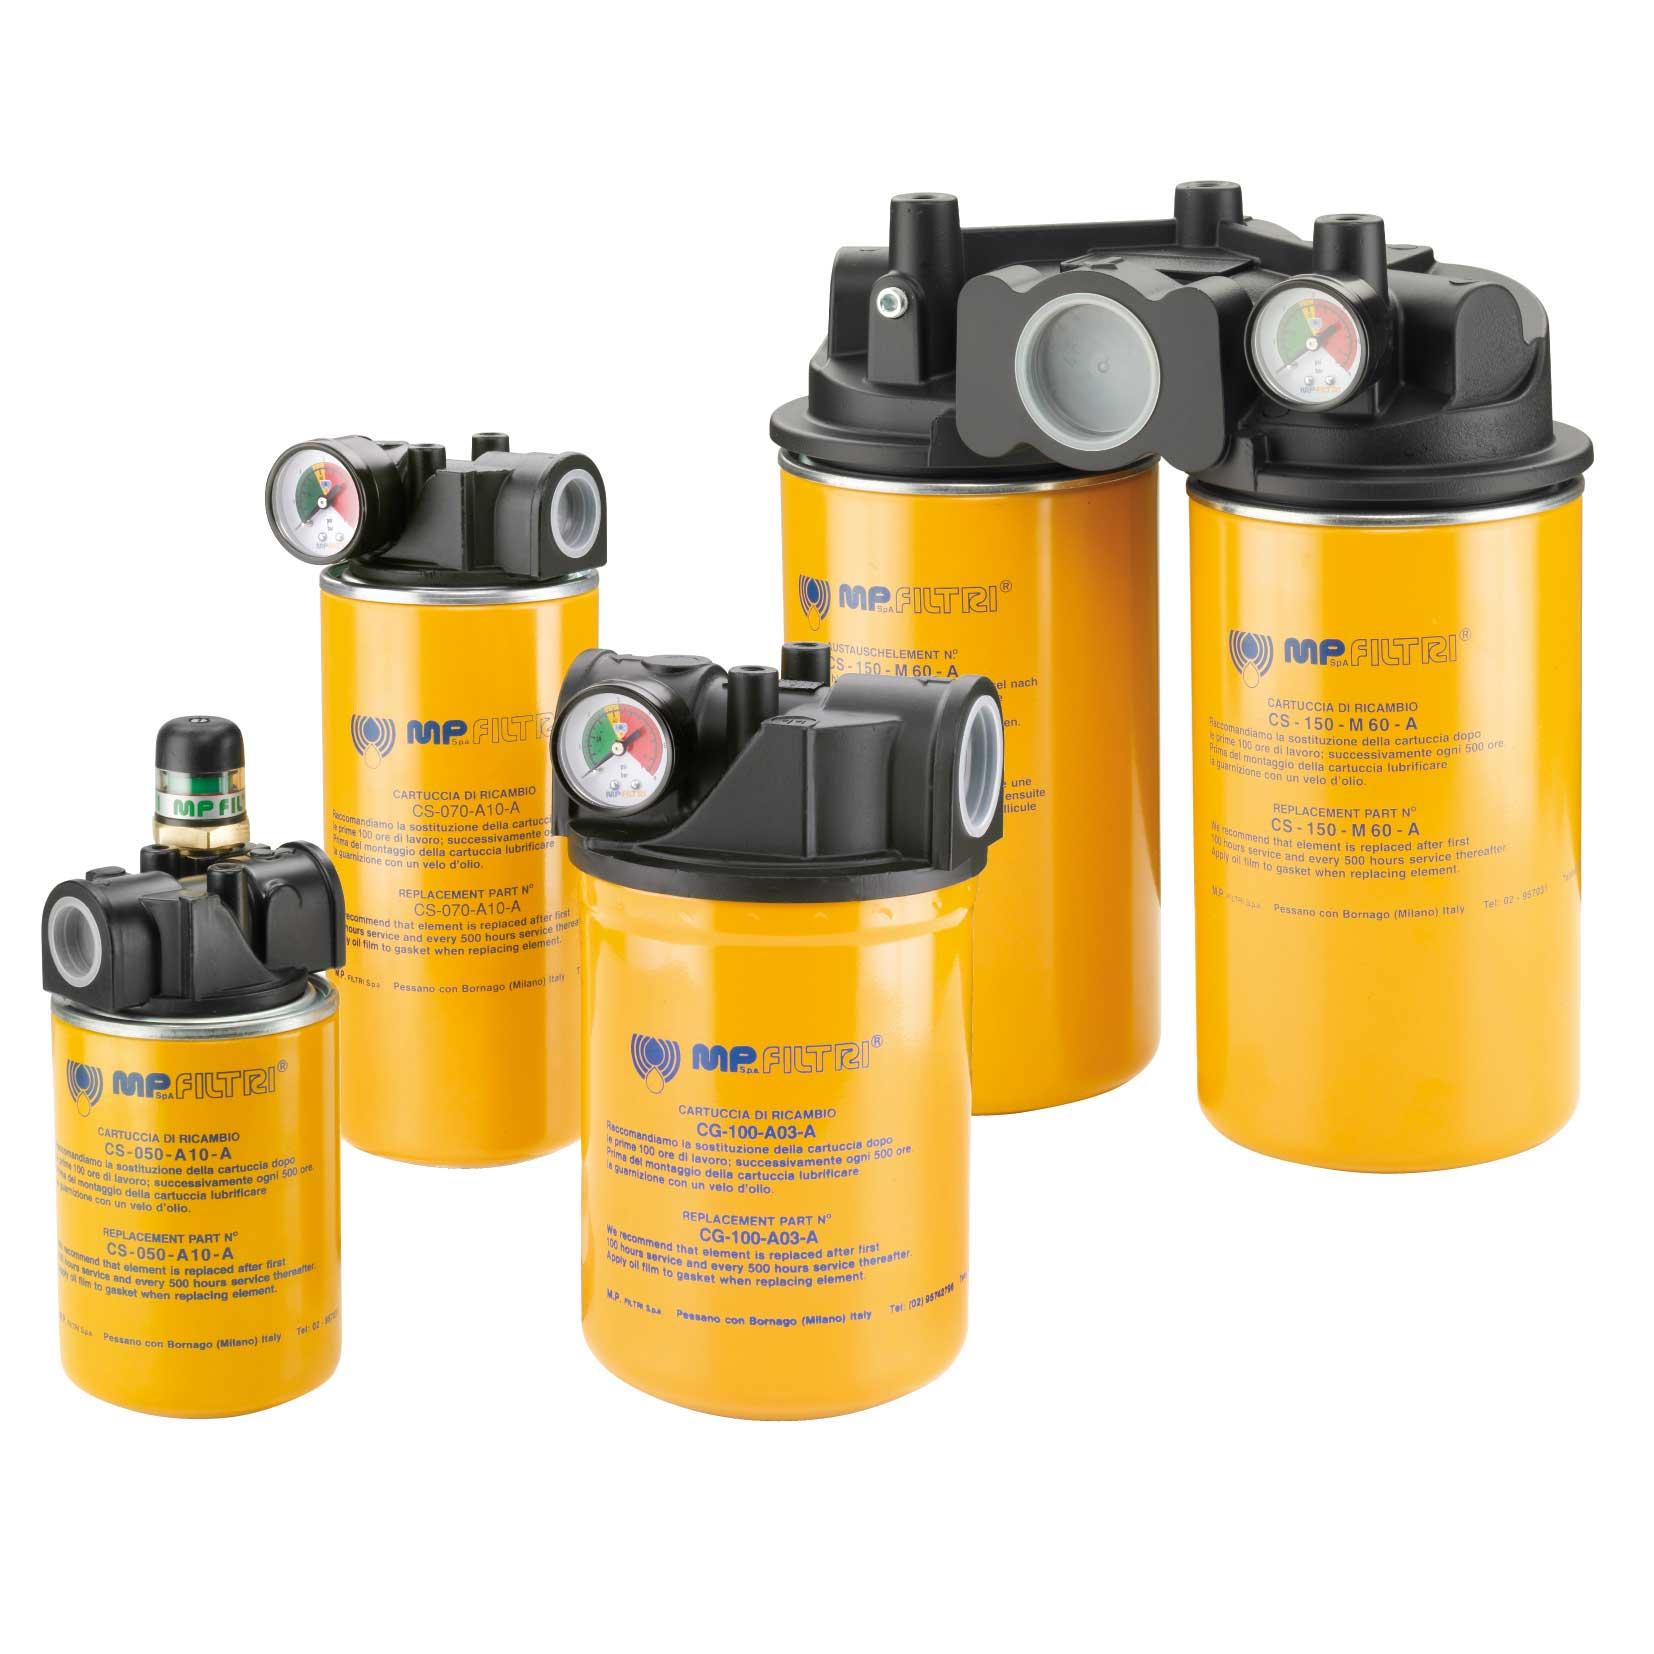 mp-filtri-series-filter